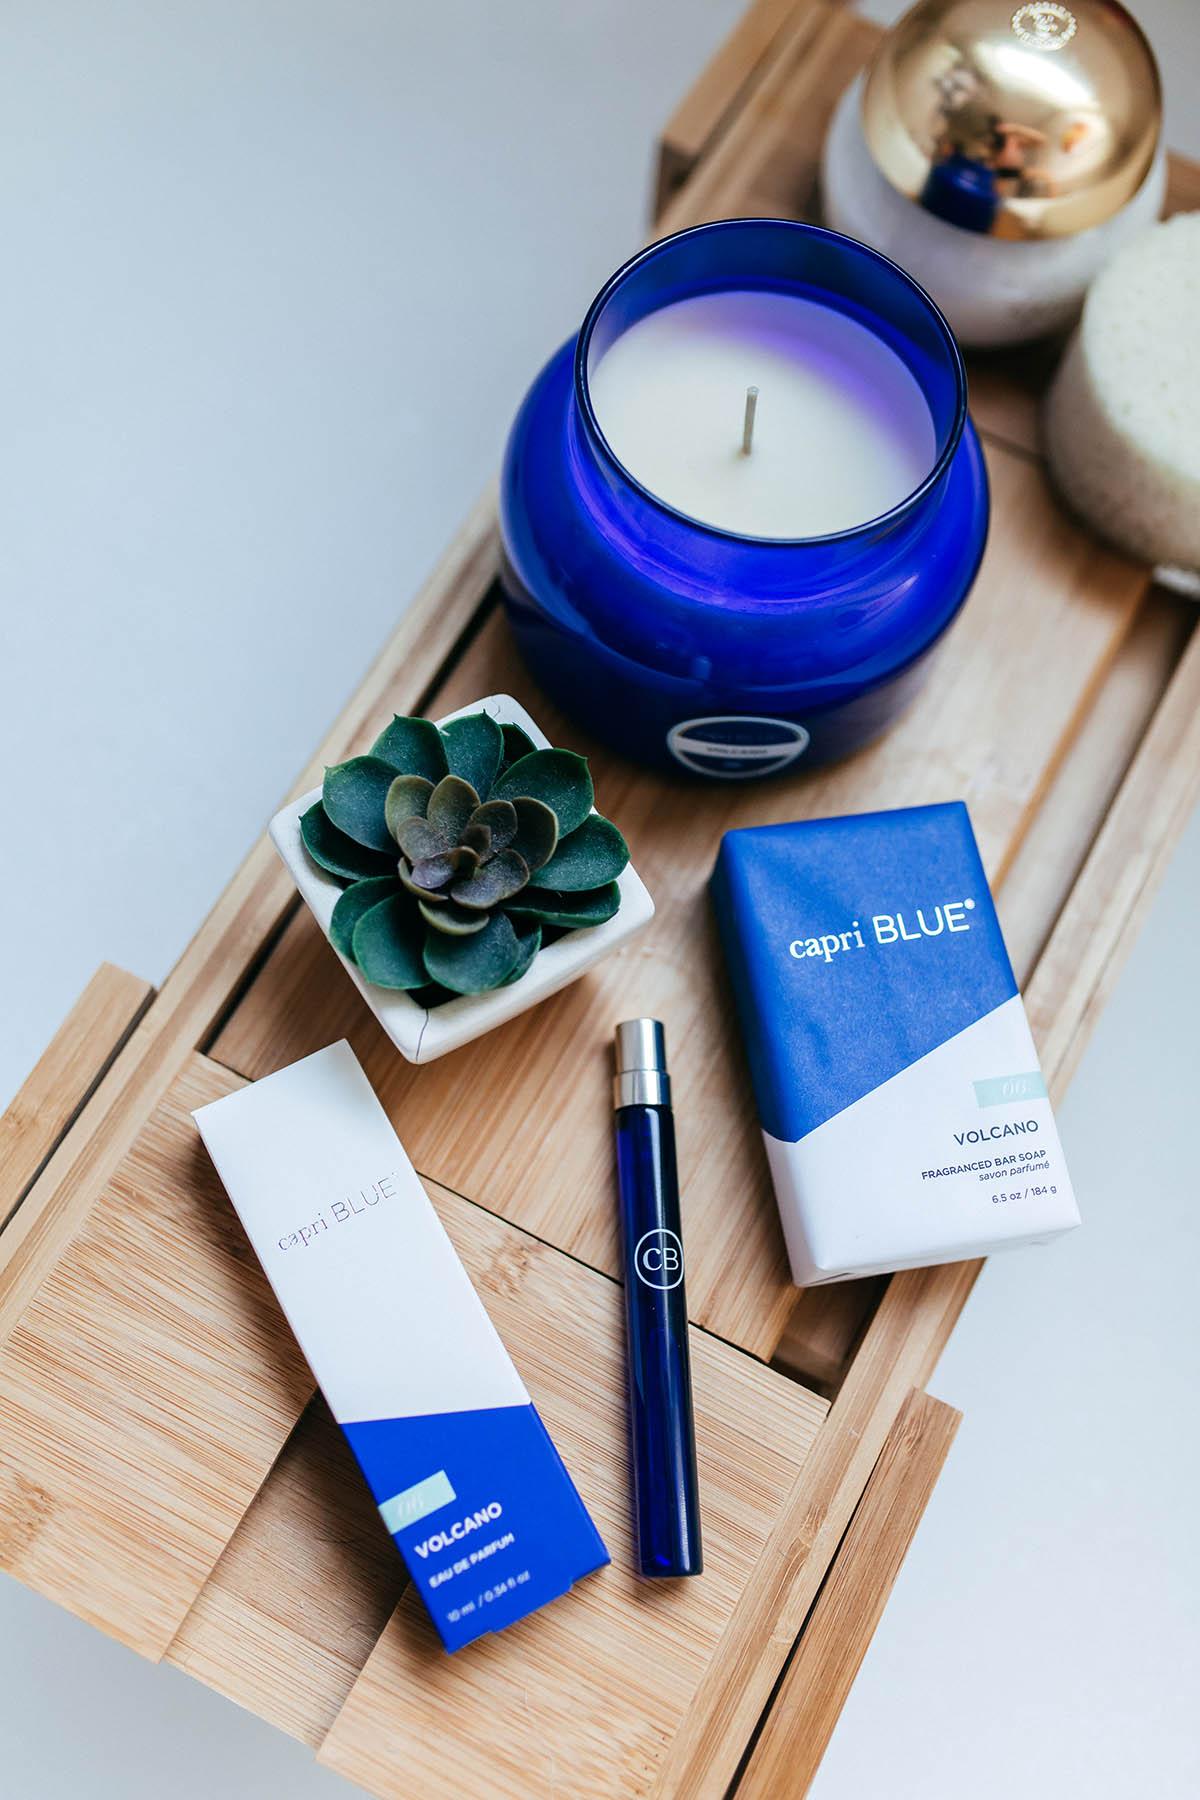 Capri Blue Volcano Products